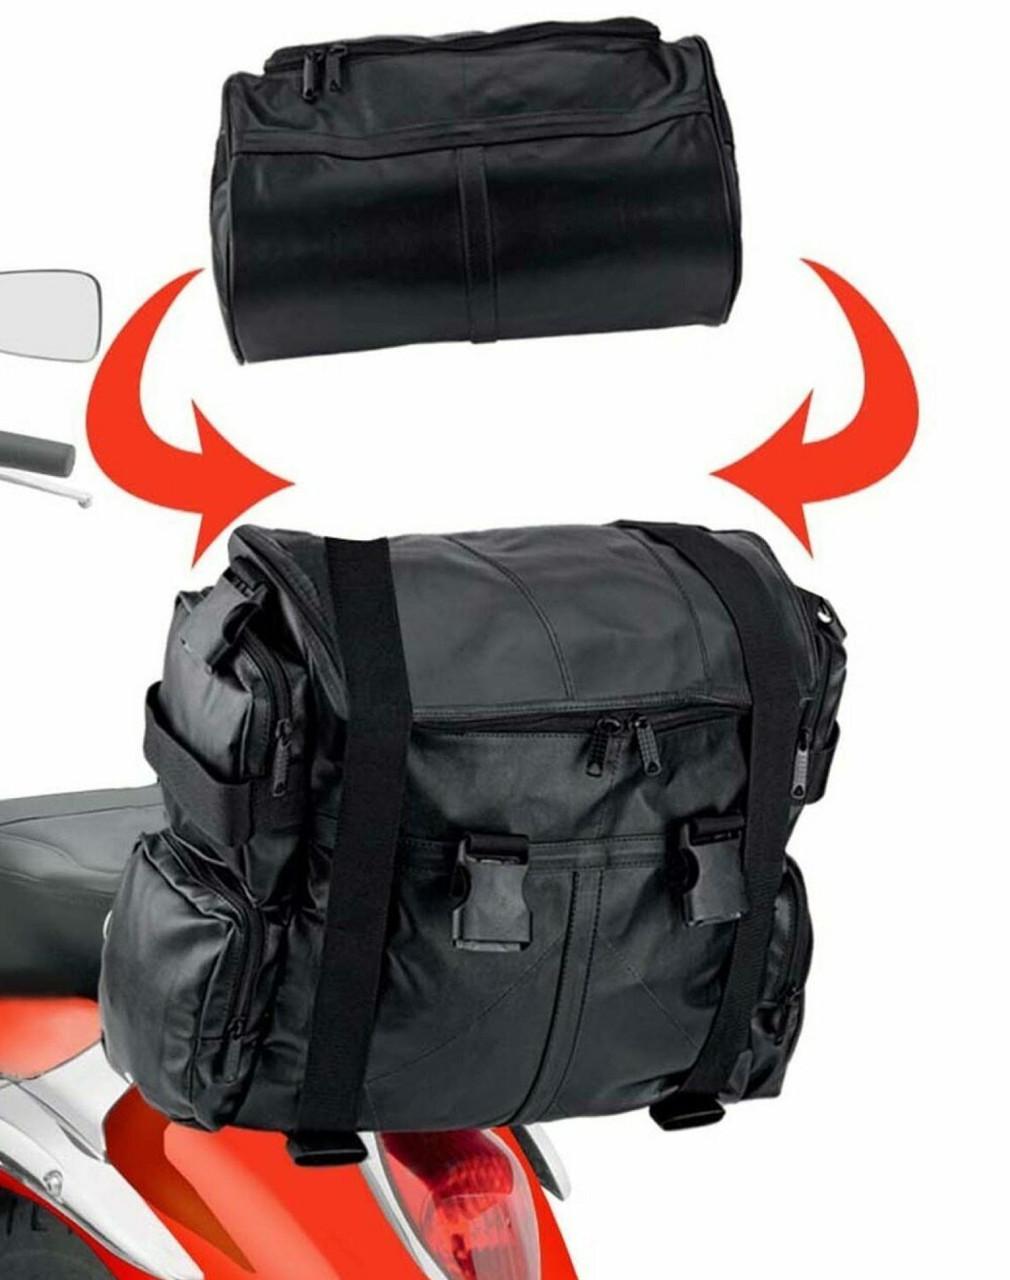 Harley Davidson Viking Aero Medium Expandable Motorcycle Sissy Bar Bags Roll Bag View